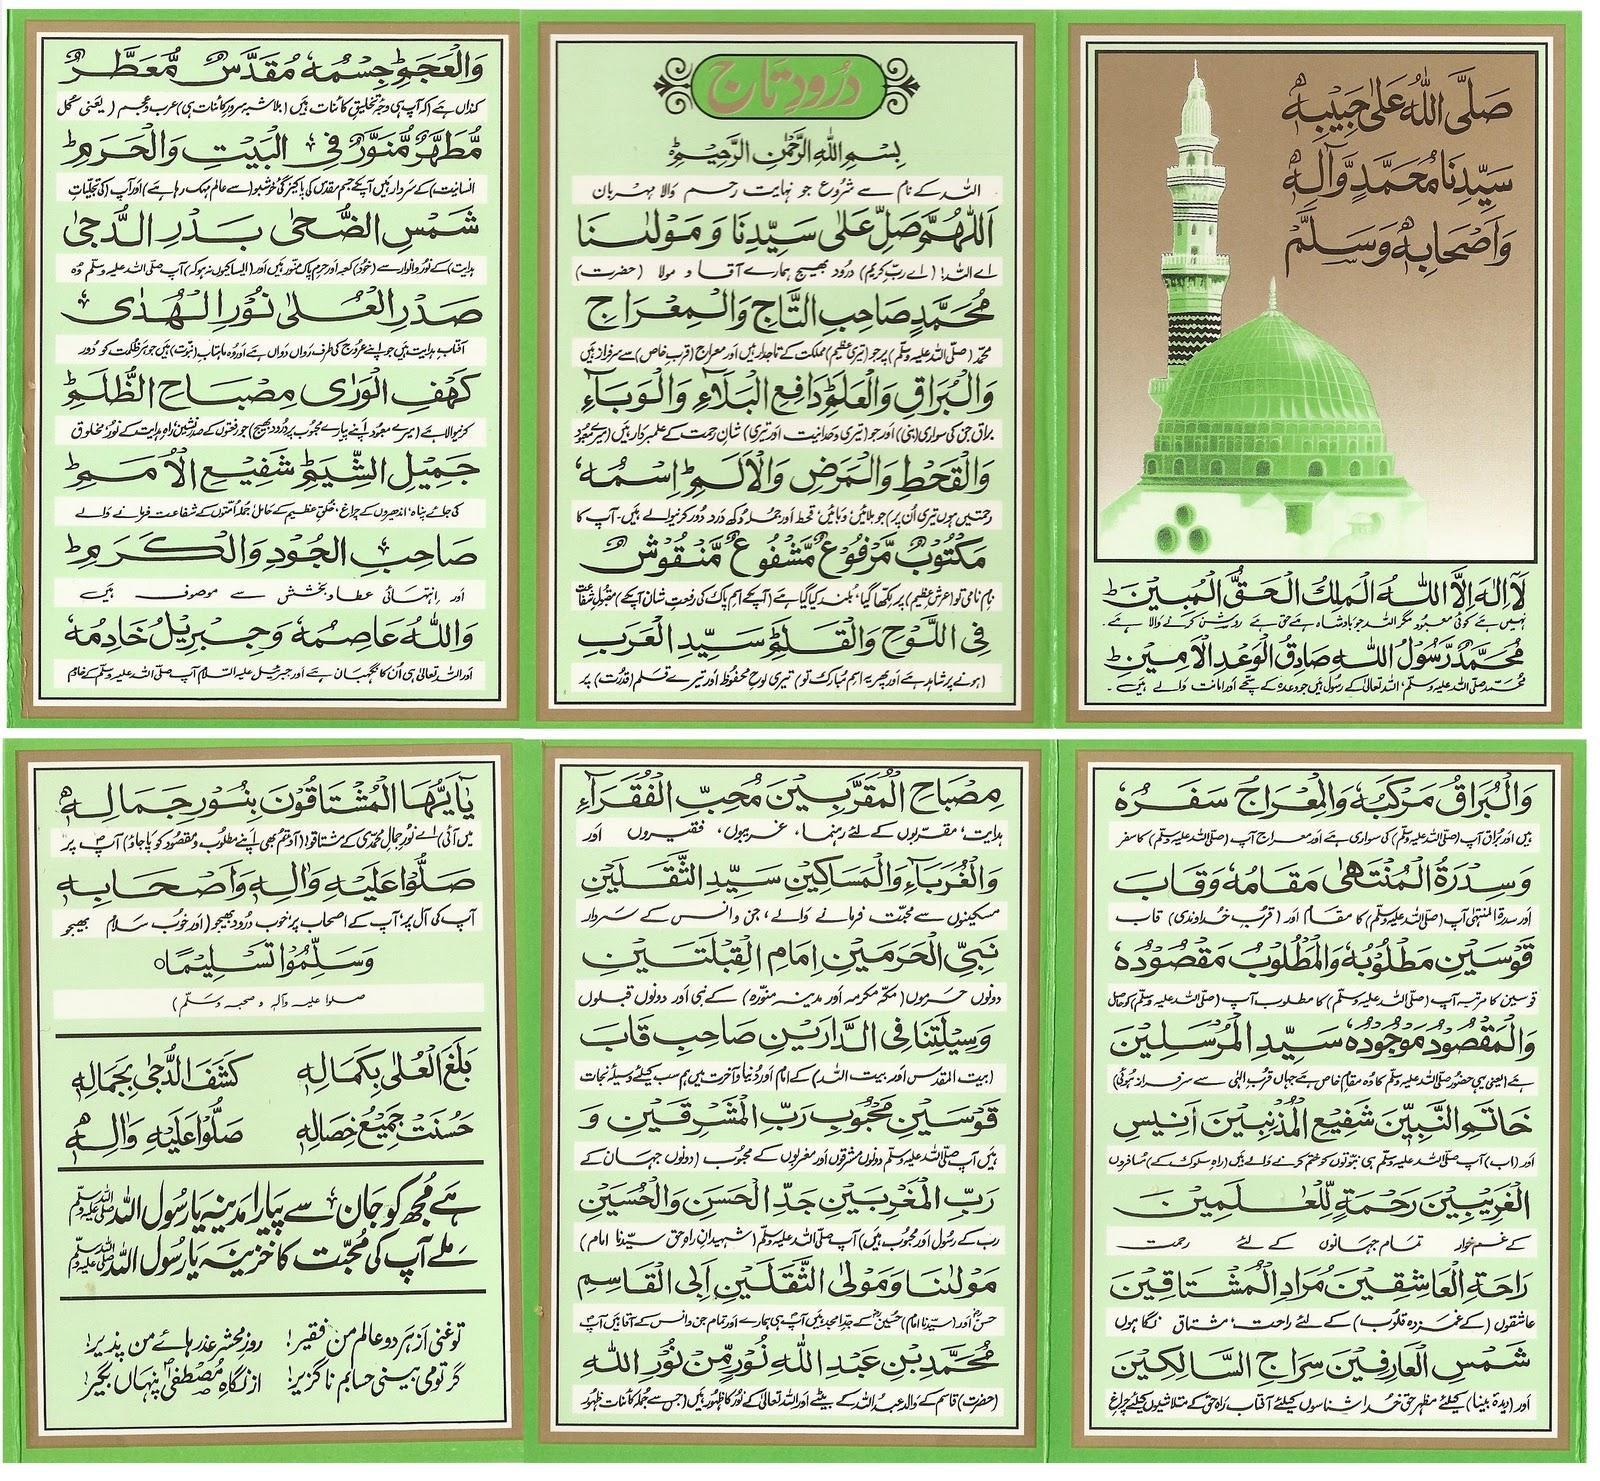 Ibrahim 3d Name Wallpaper Quran Hadith Sunnah Mobile Wallpaper Islamic Channel